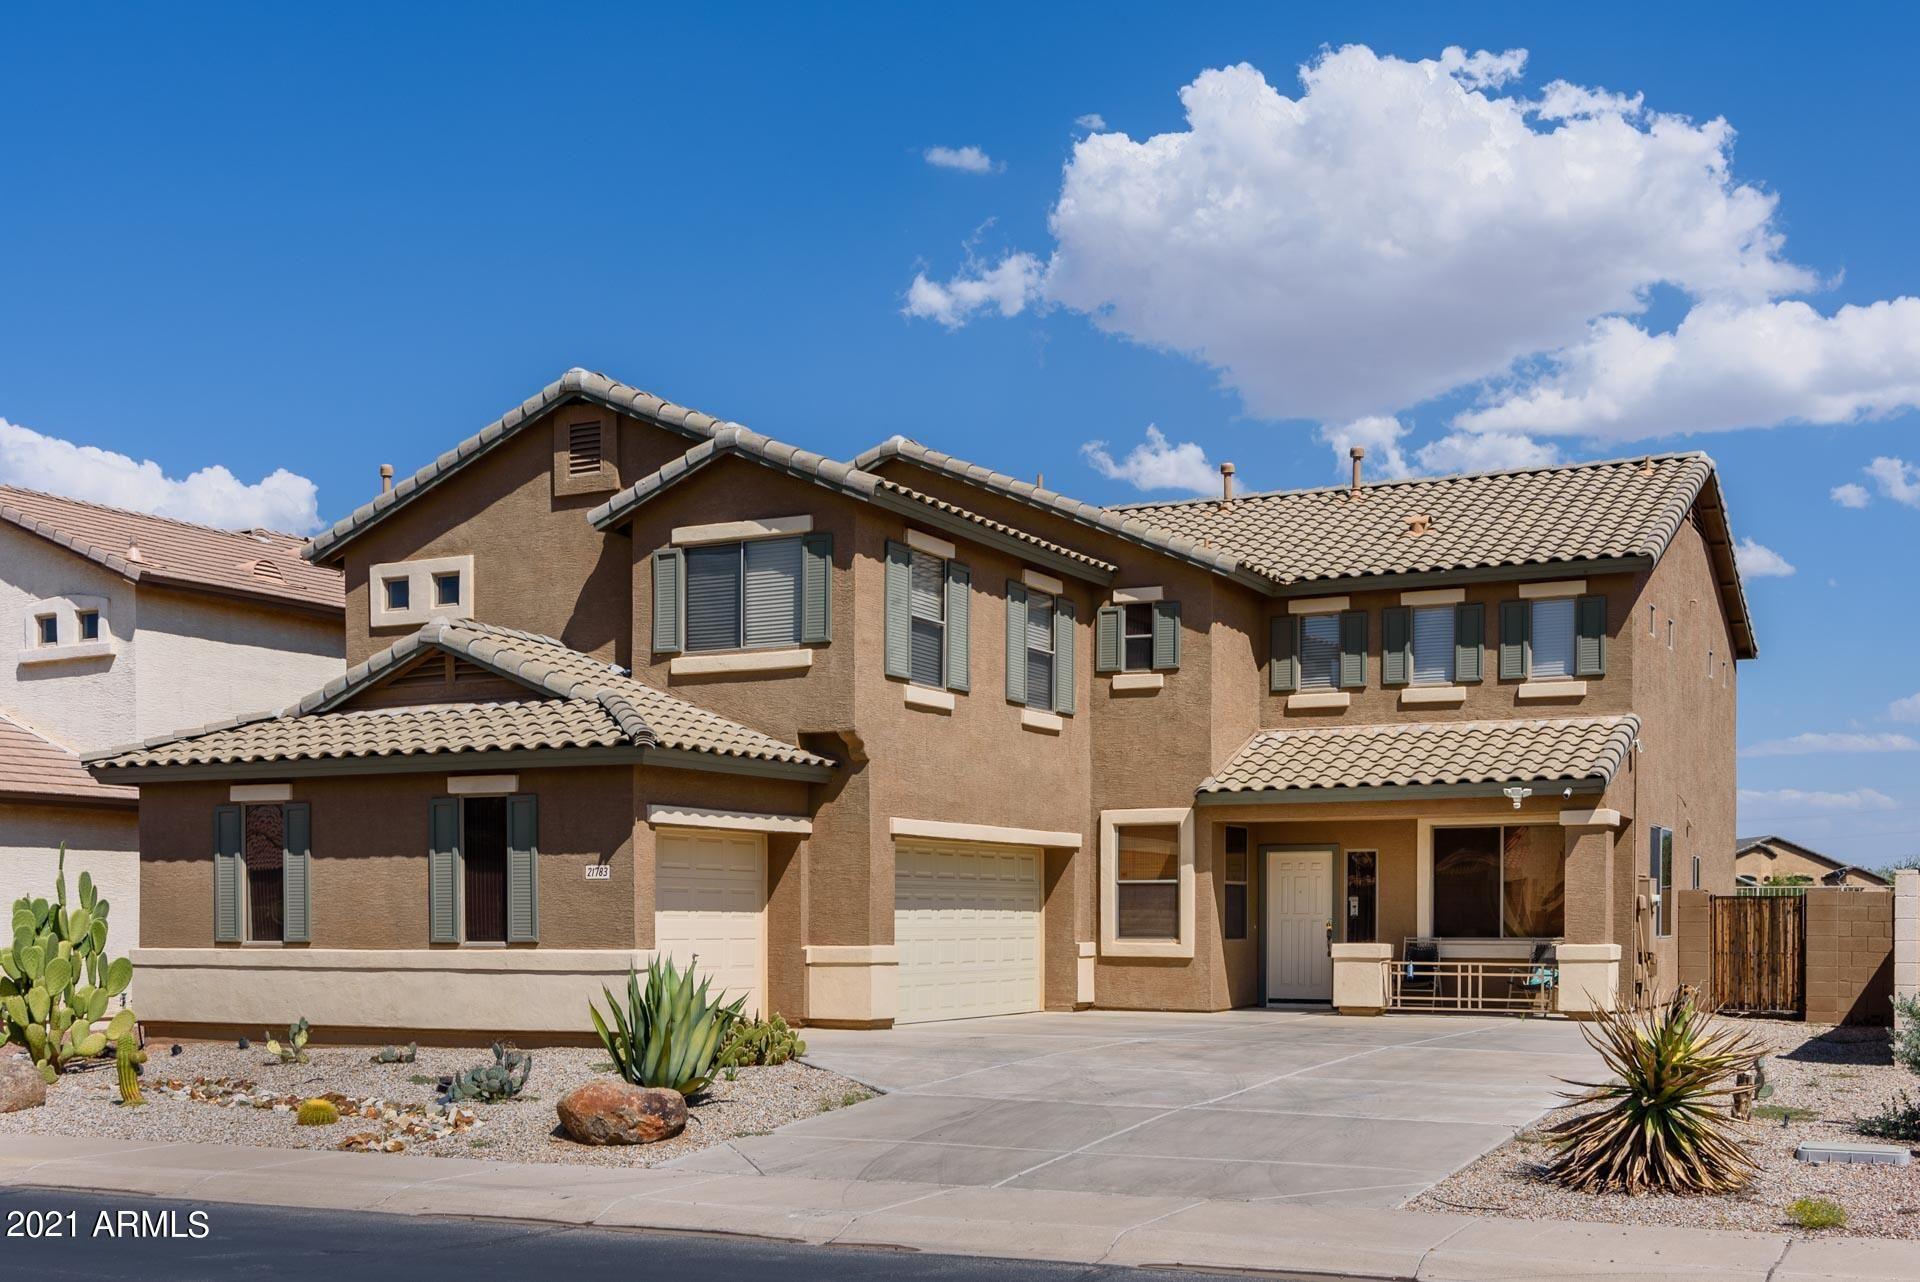 Photo for 21783 N BACKUS Drive, Maricopa, AZ 85138 (MLS # 6291702)